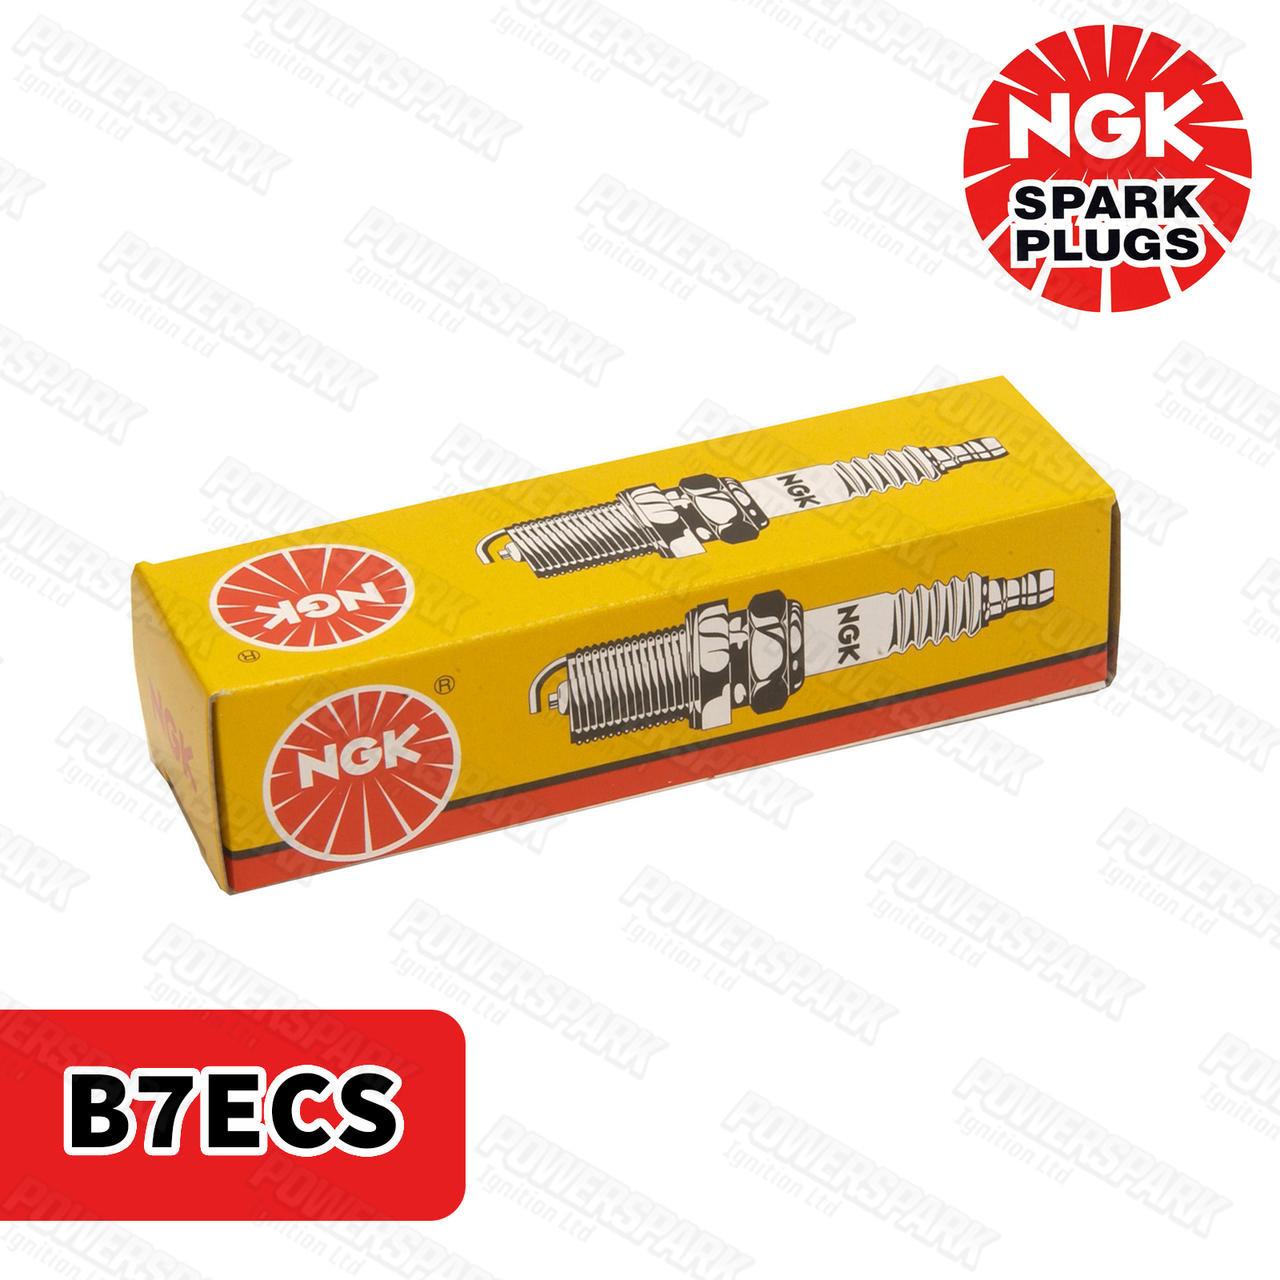 NGK Spark Plugs NGK B7ECS Spark Plug for Classic and Modern Cars